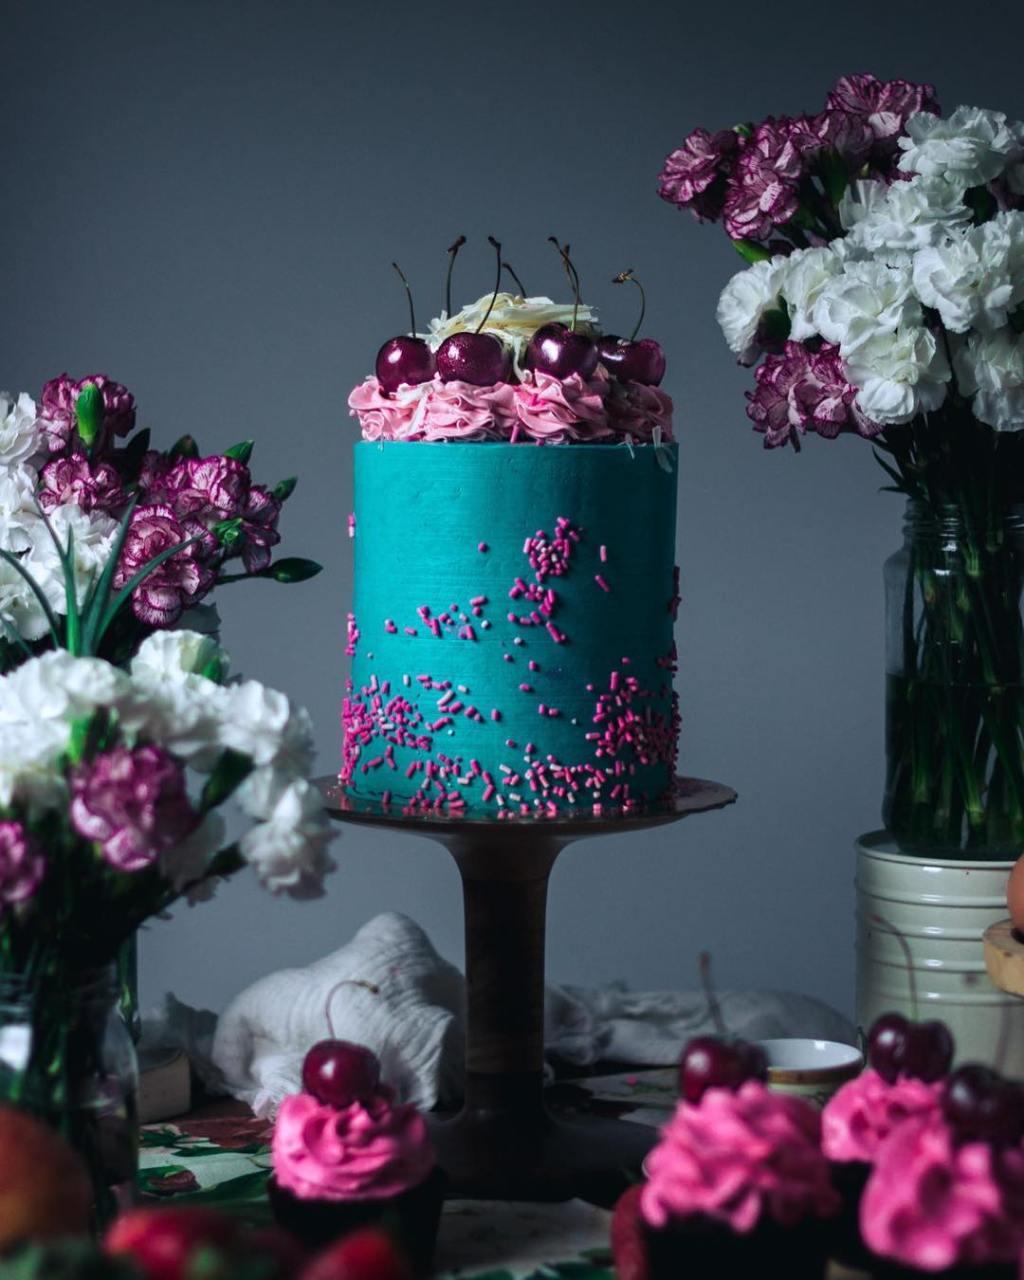 julian-angel-cakes-fairytales-3